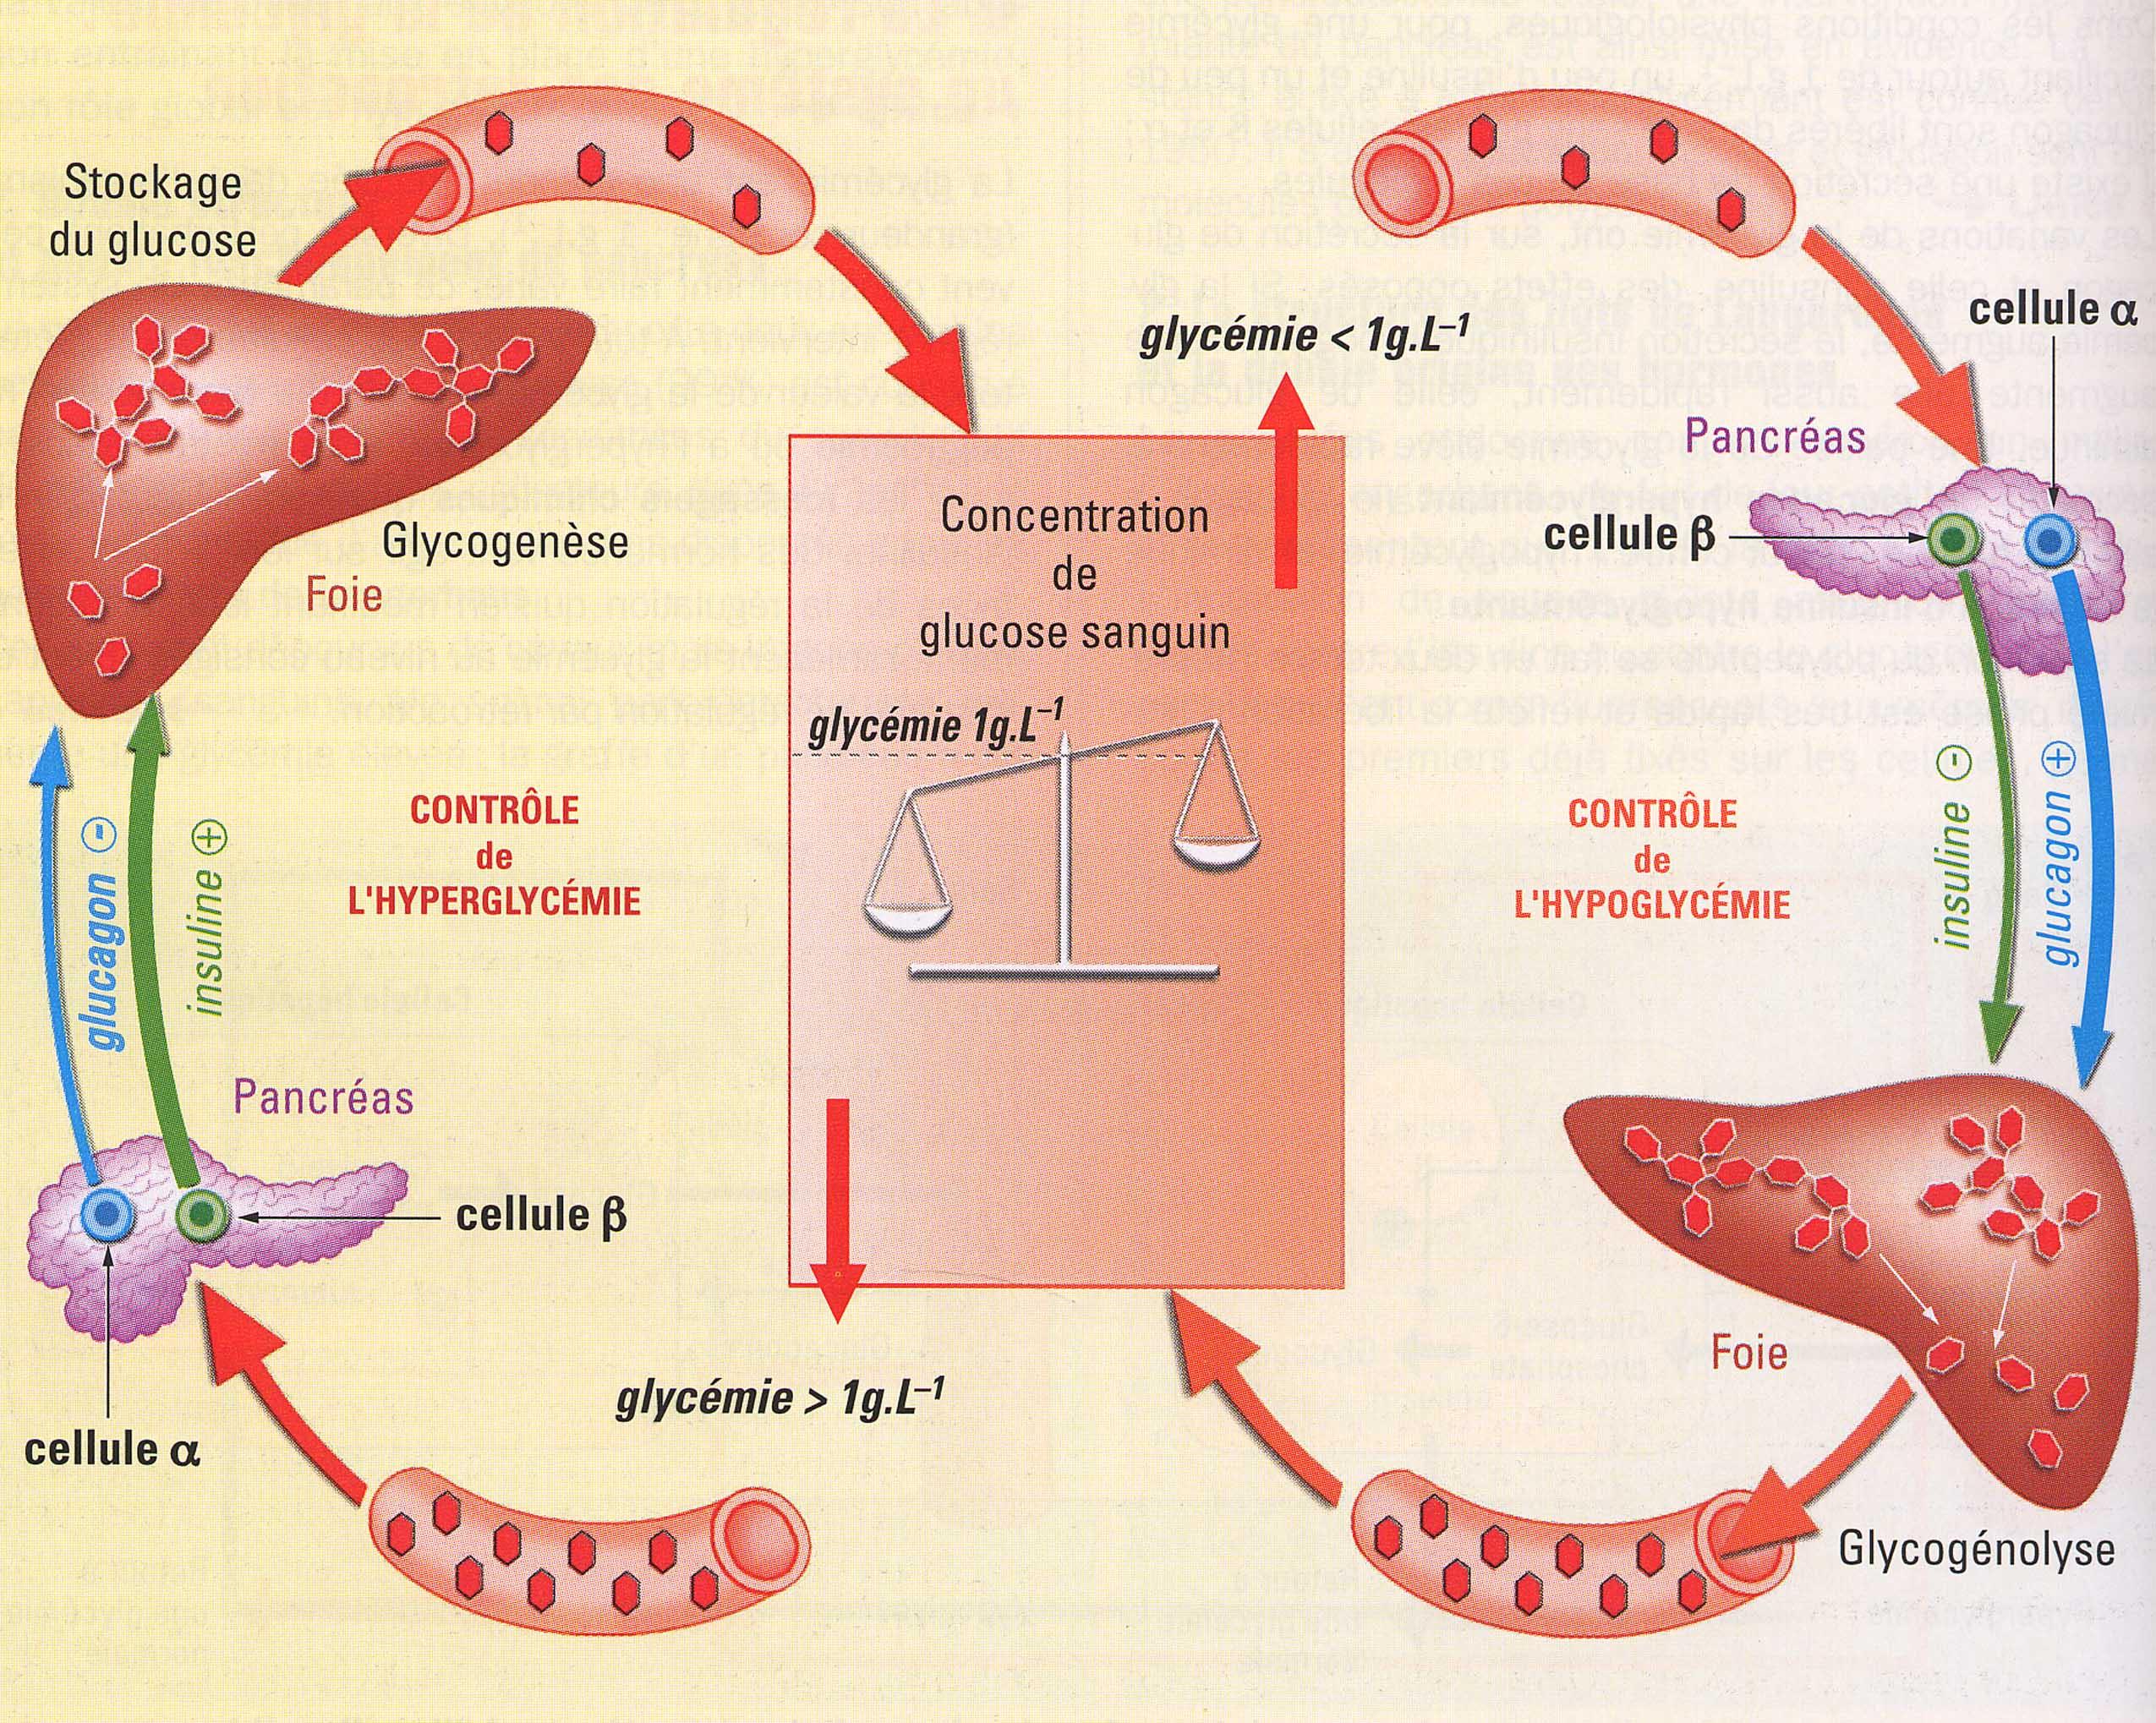 Cellules alpha et béta